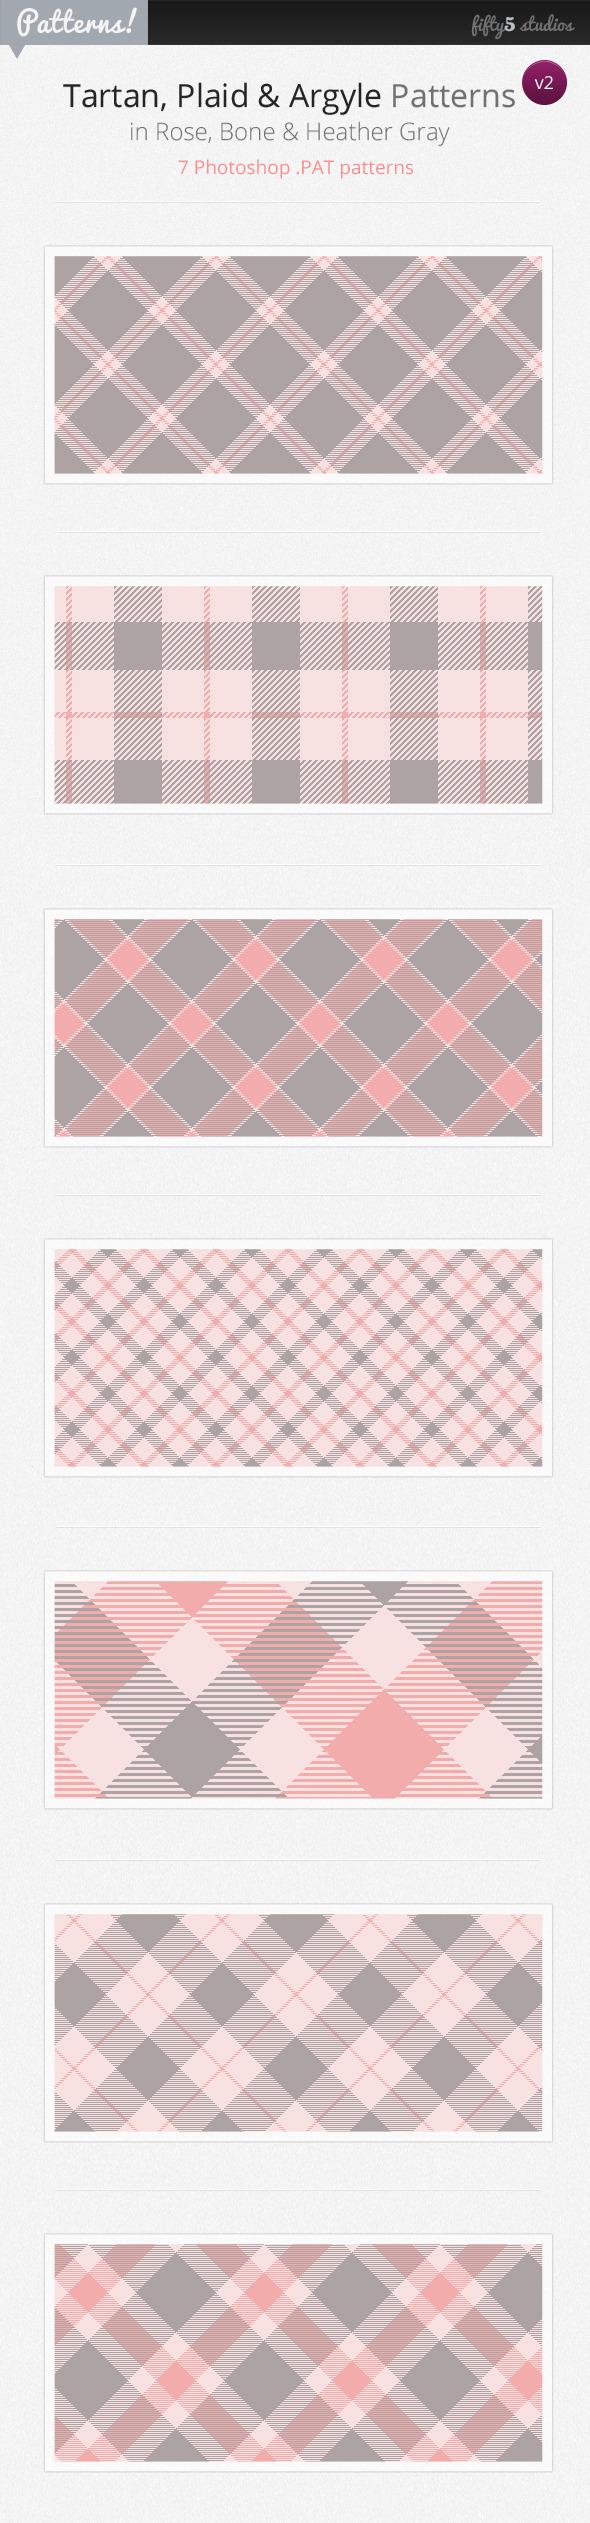 7 Tartan, Plaid & Argyle Patterns - v2 - Photoshop Add-ons